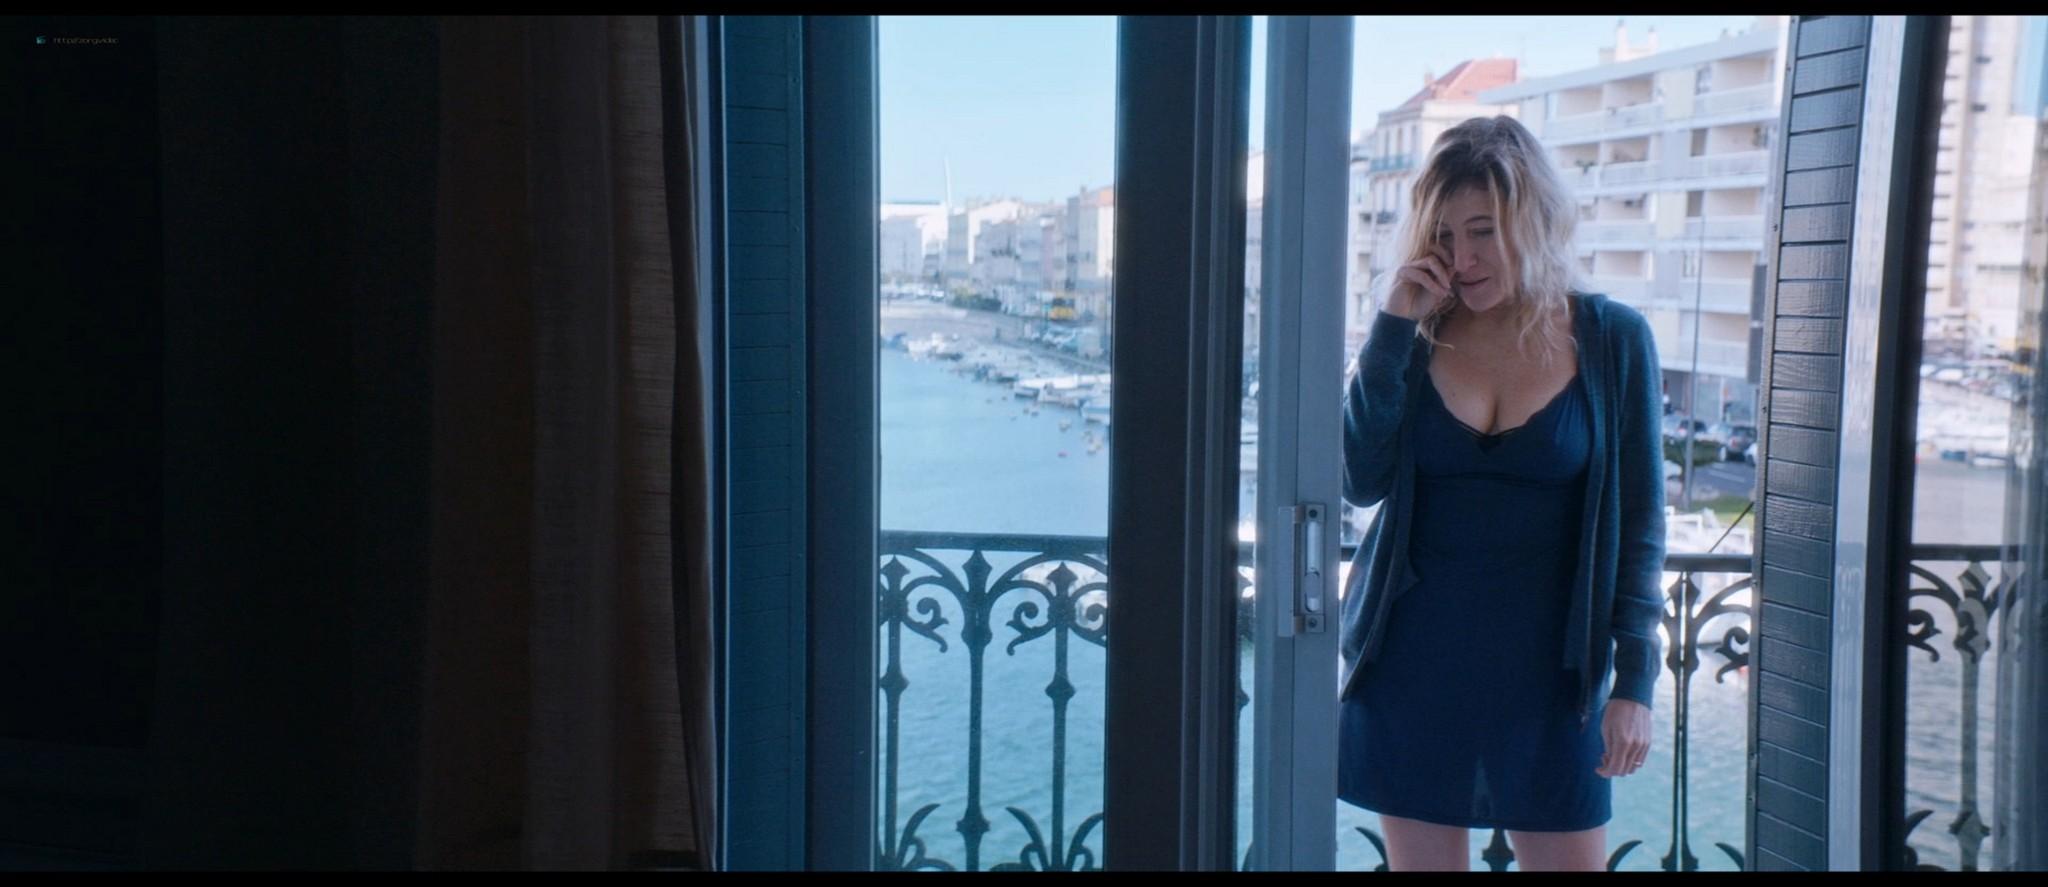 Nadia Tereszkiewicz nude lesbian sex with Valeria Bruni Tedeschi - Seules les bêtes (FR-2019) HD 1080p BluRay (7)